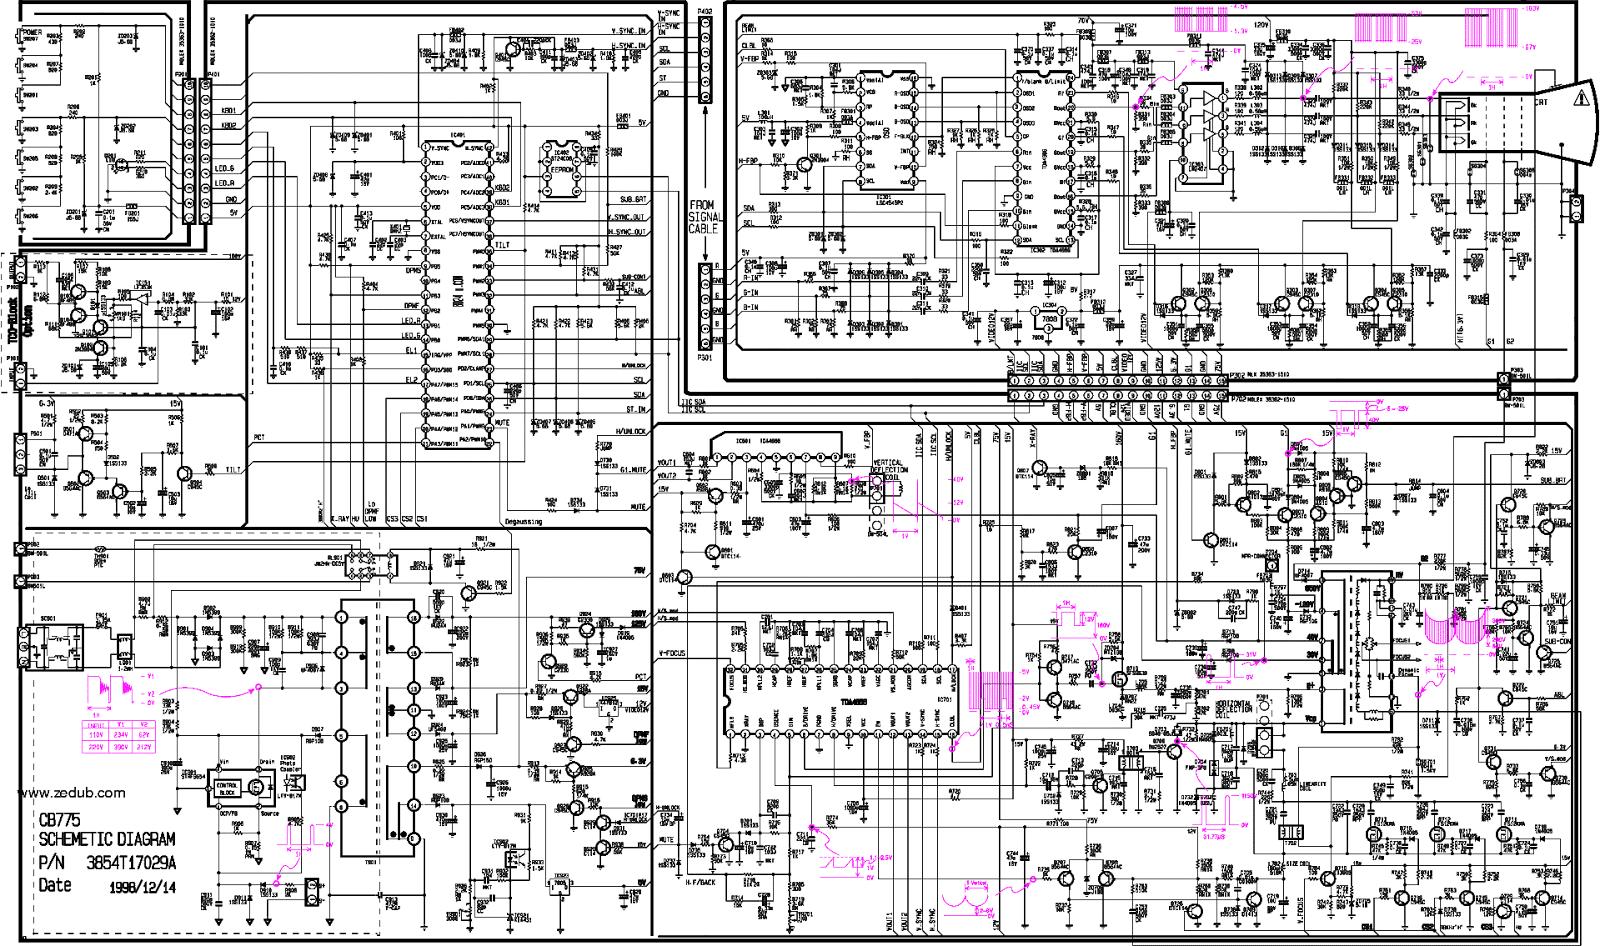 Lg TV Circuit Diagram   Learn Basic Electronics,Circuit